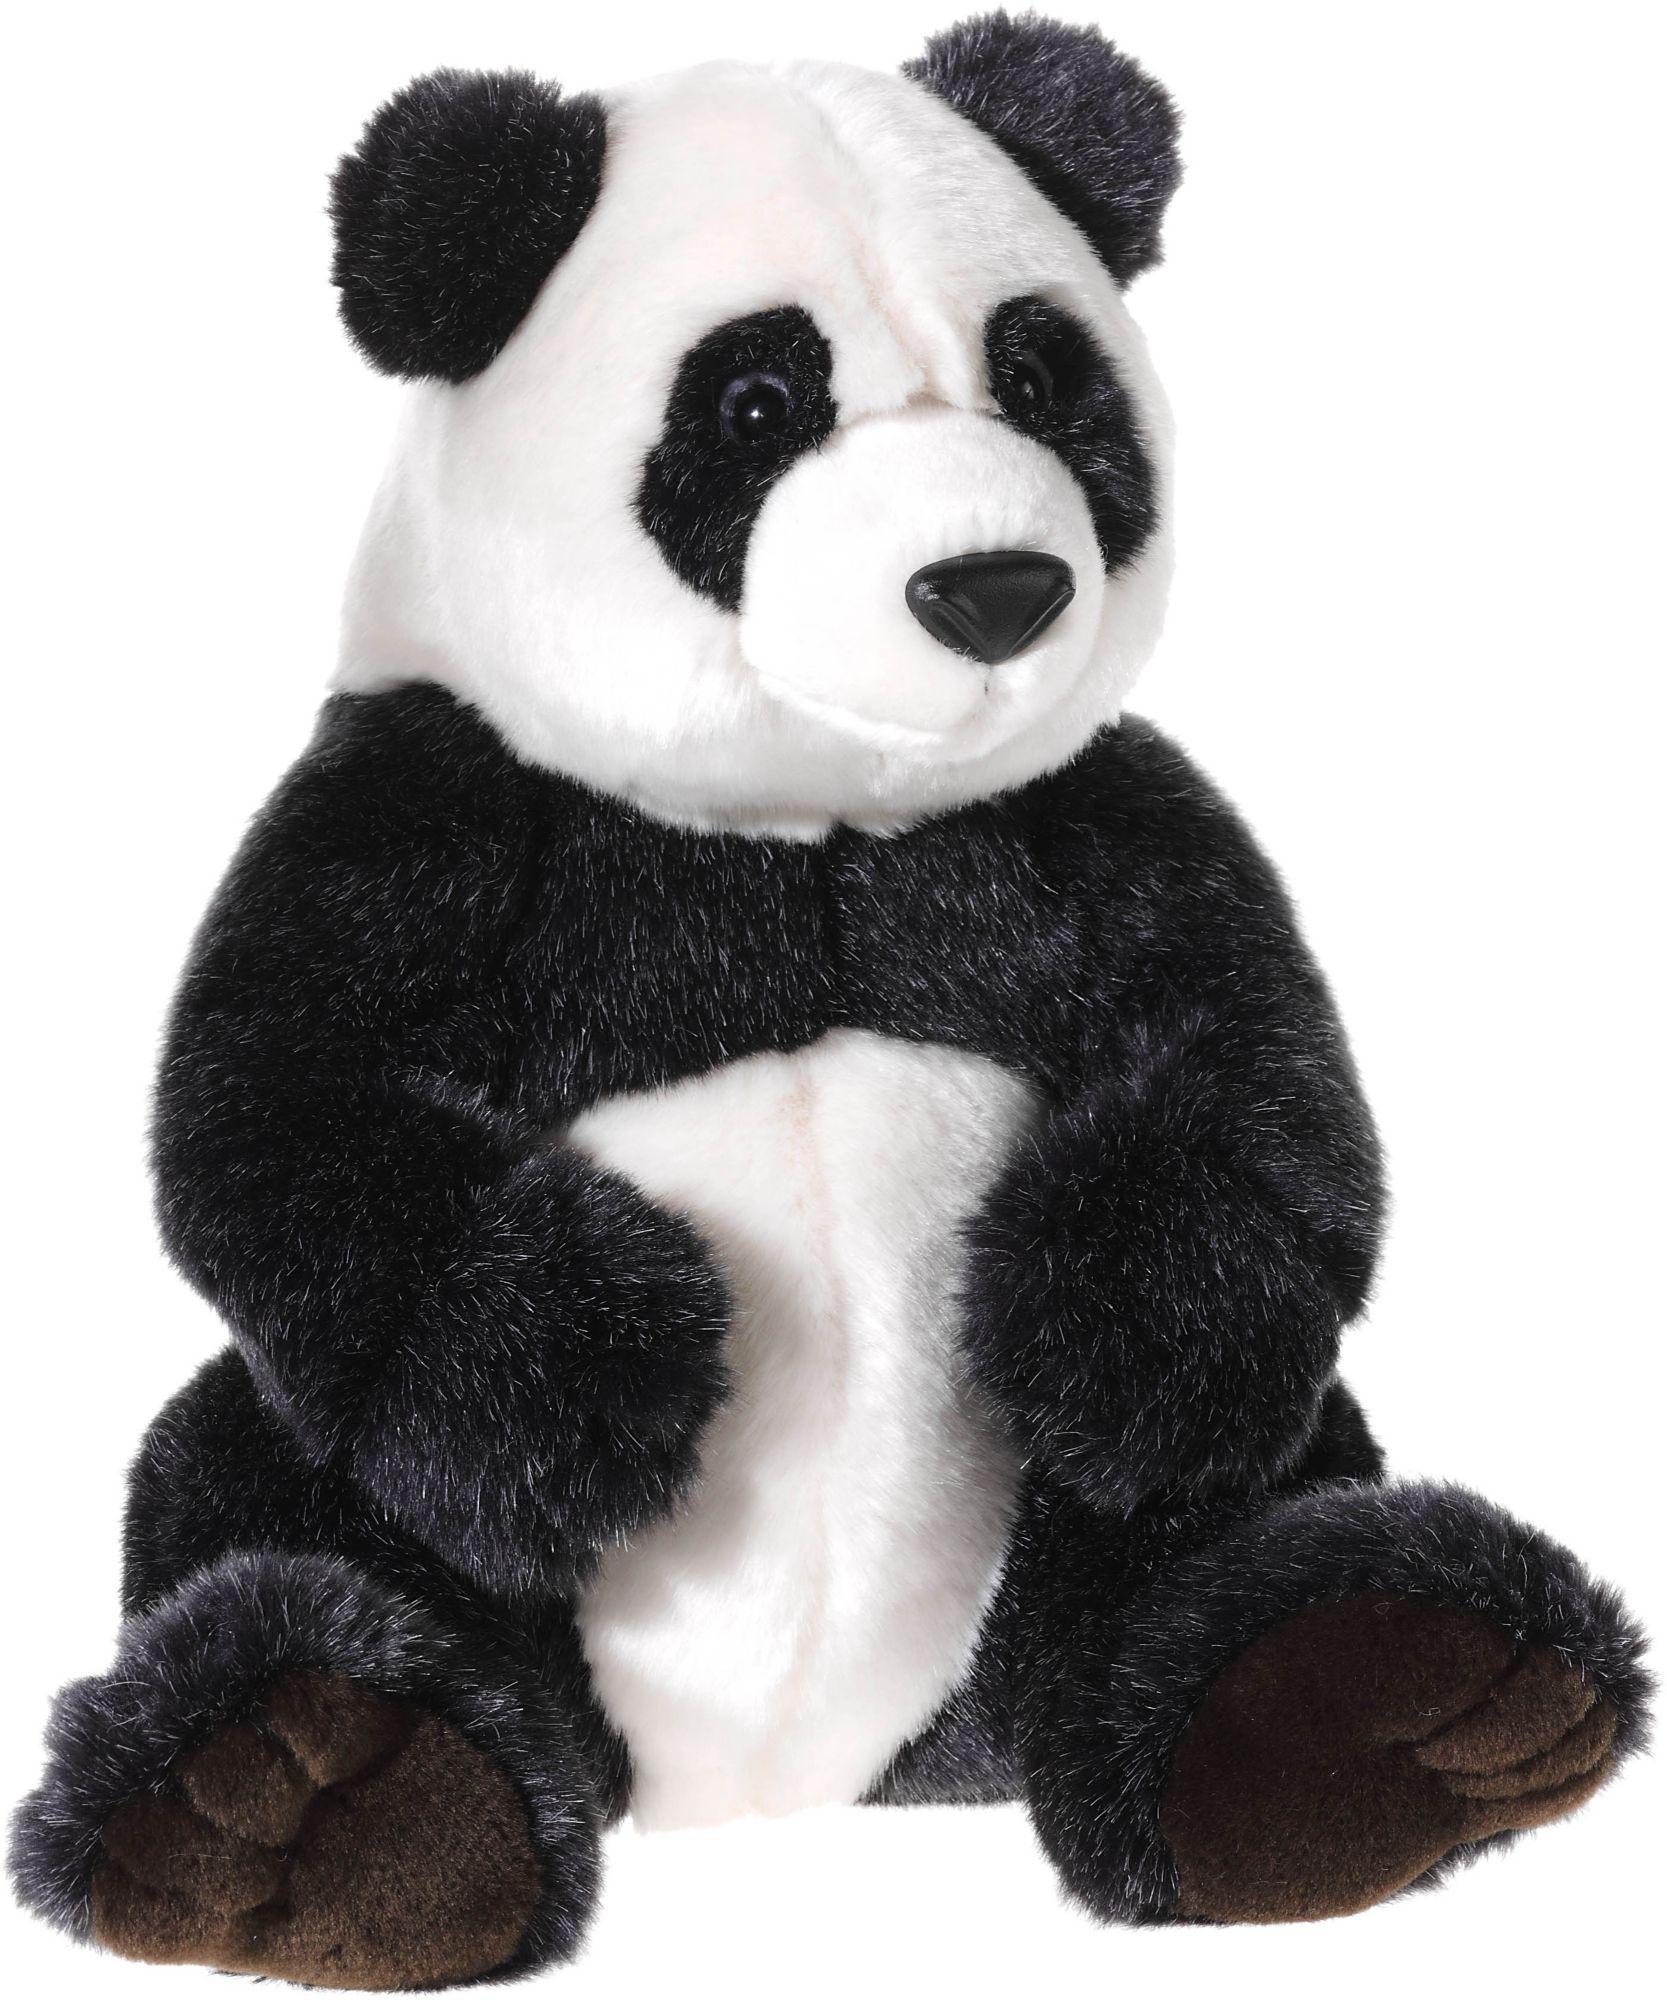 HEUNEC Heunec Kuscheltier, »Mi Classico, Pandabär 28 cm«